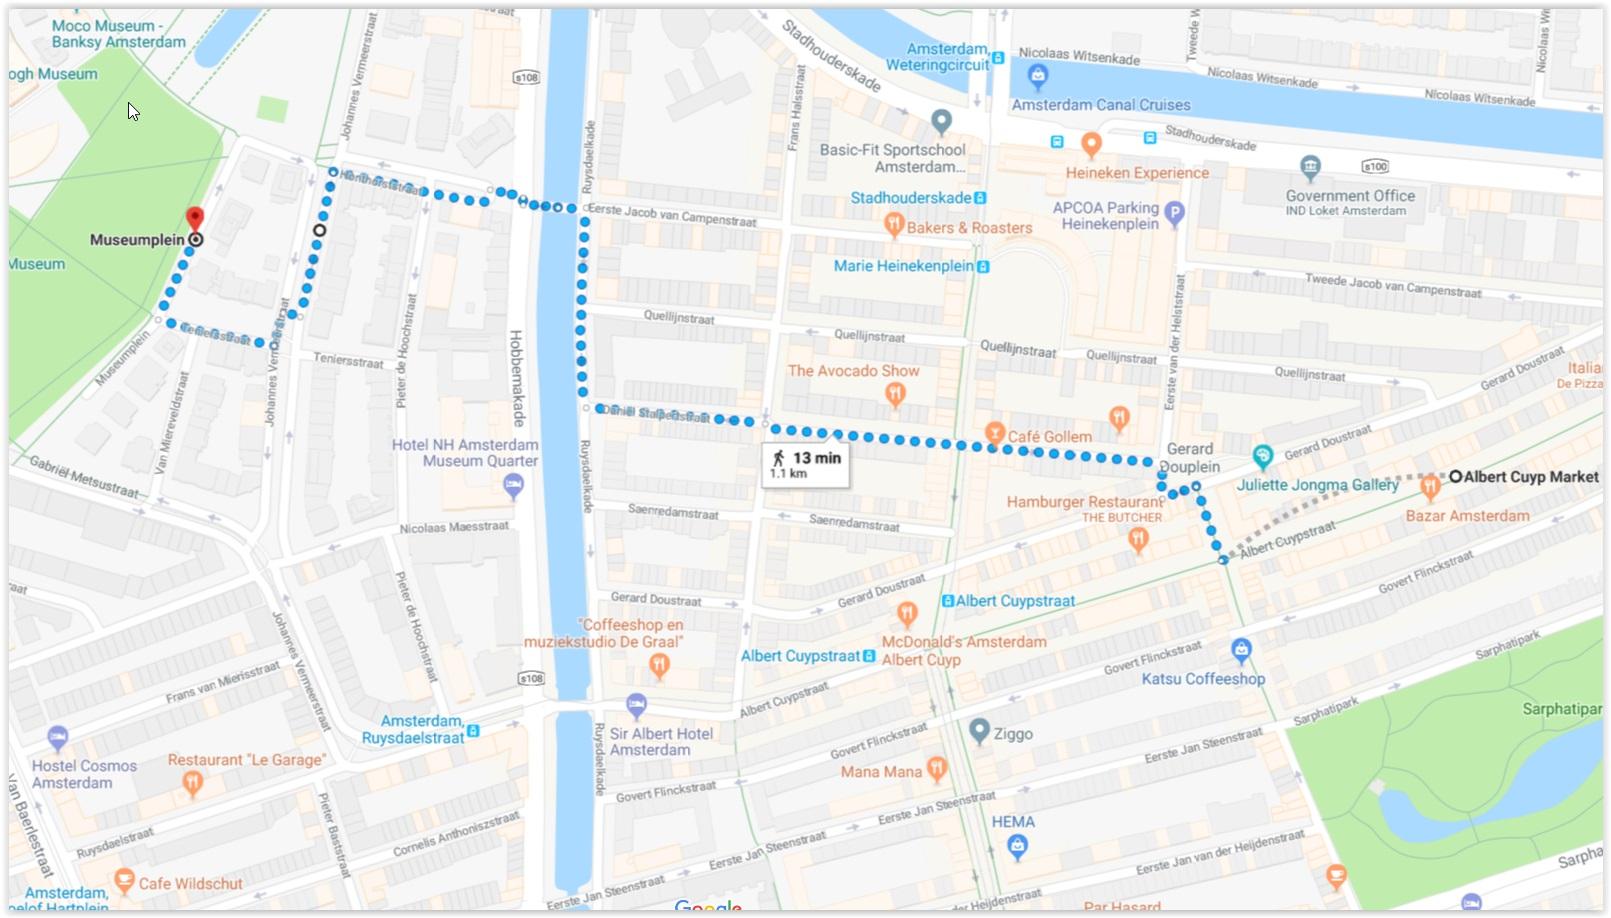 Albert Cuyp to Museumplein Map